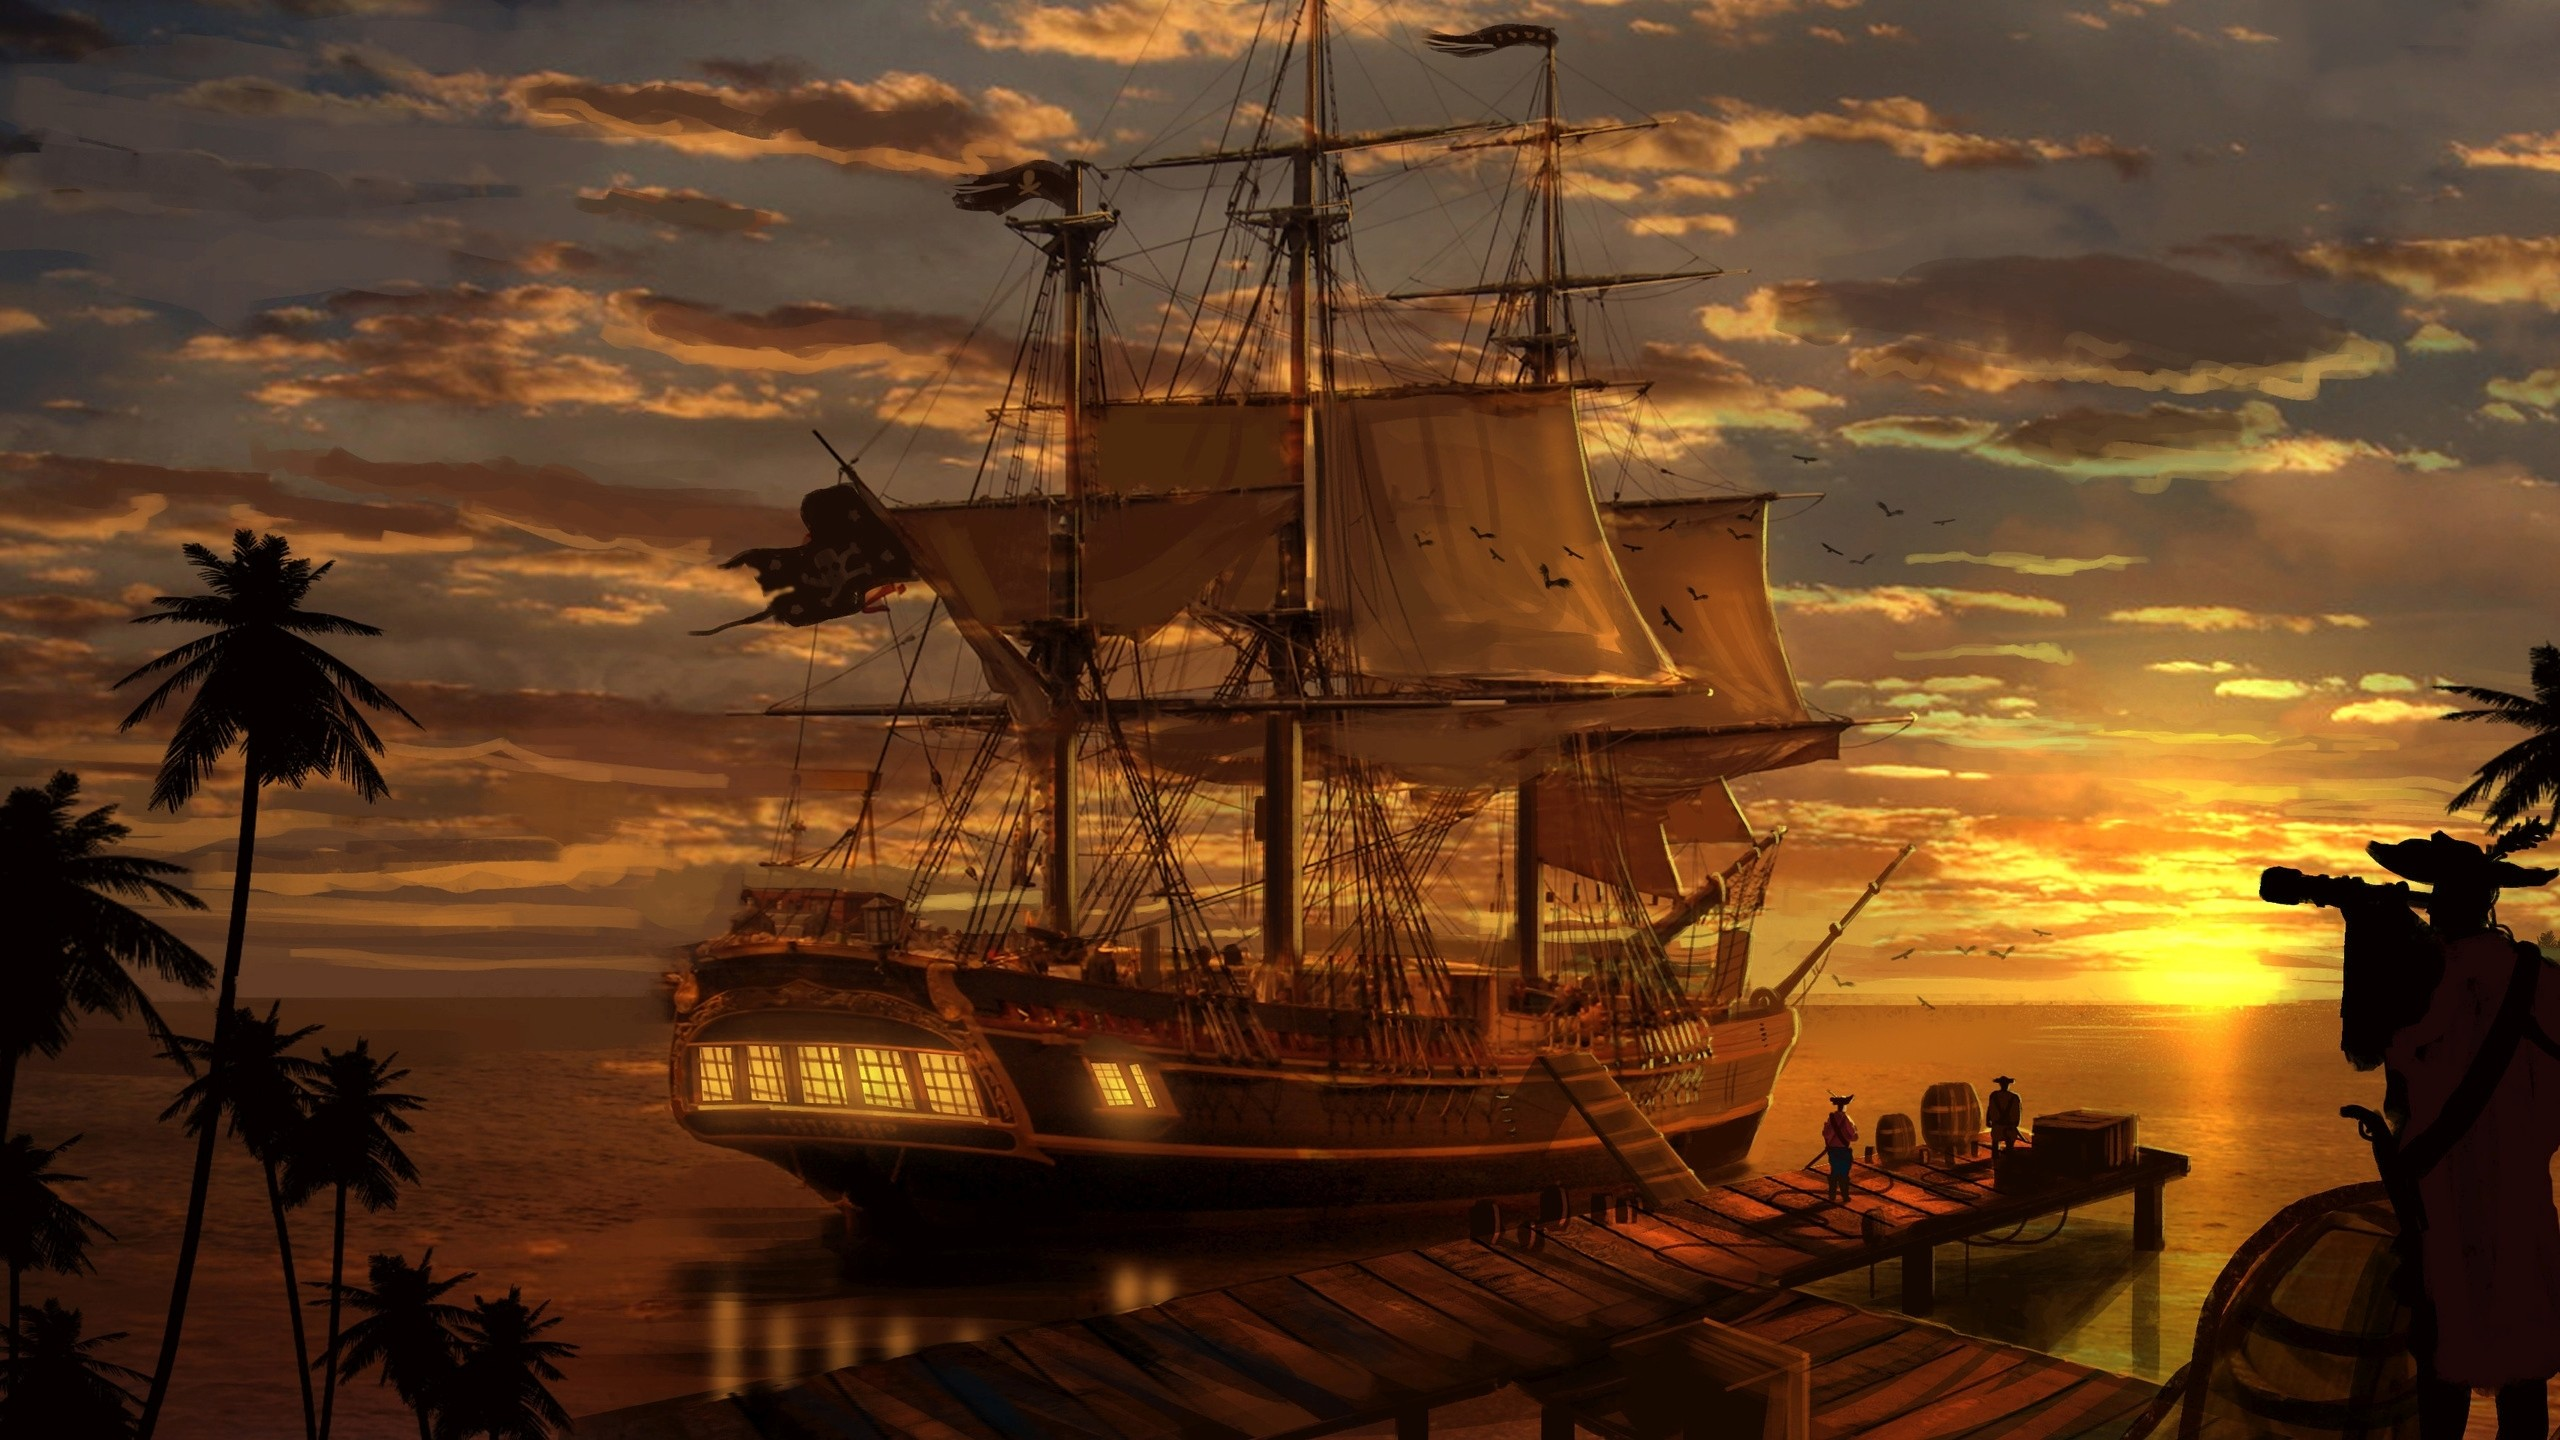 Pirate Ship Wallpaper 2560×1440